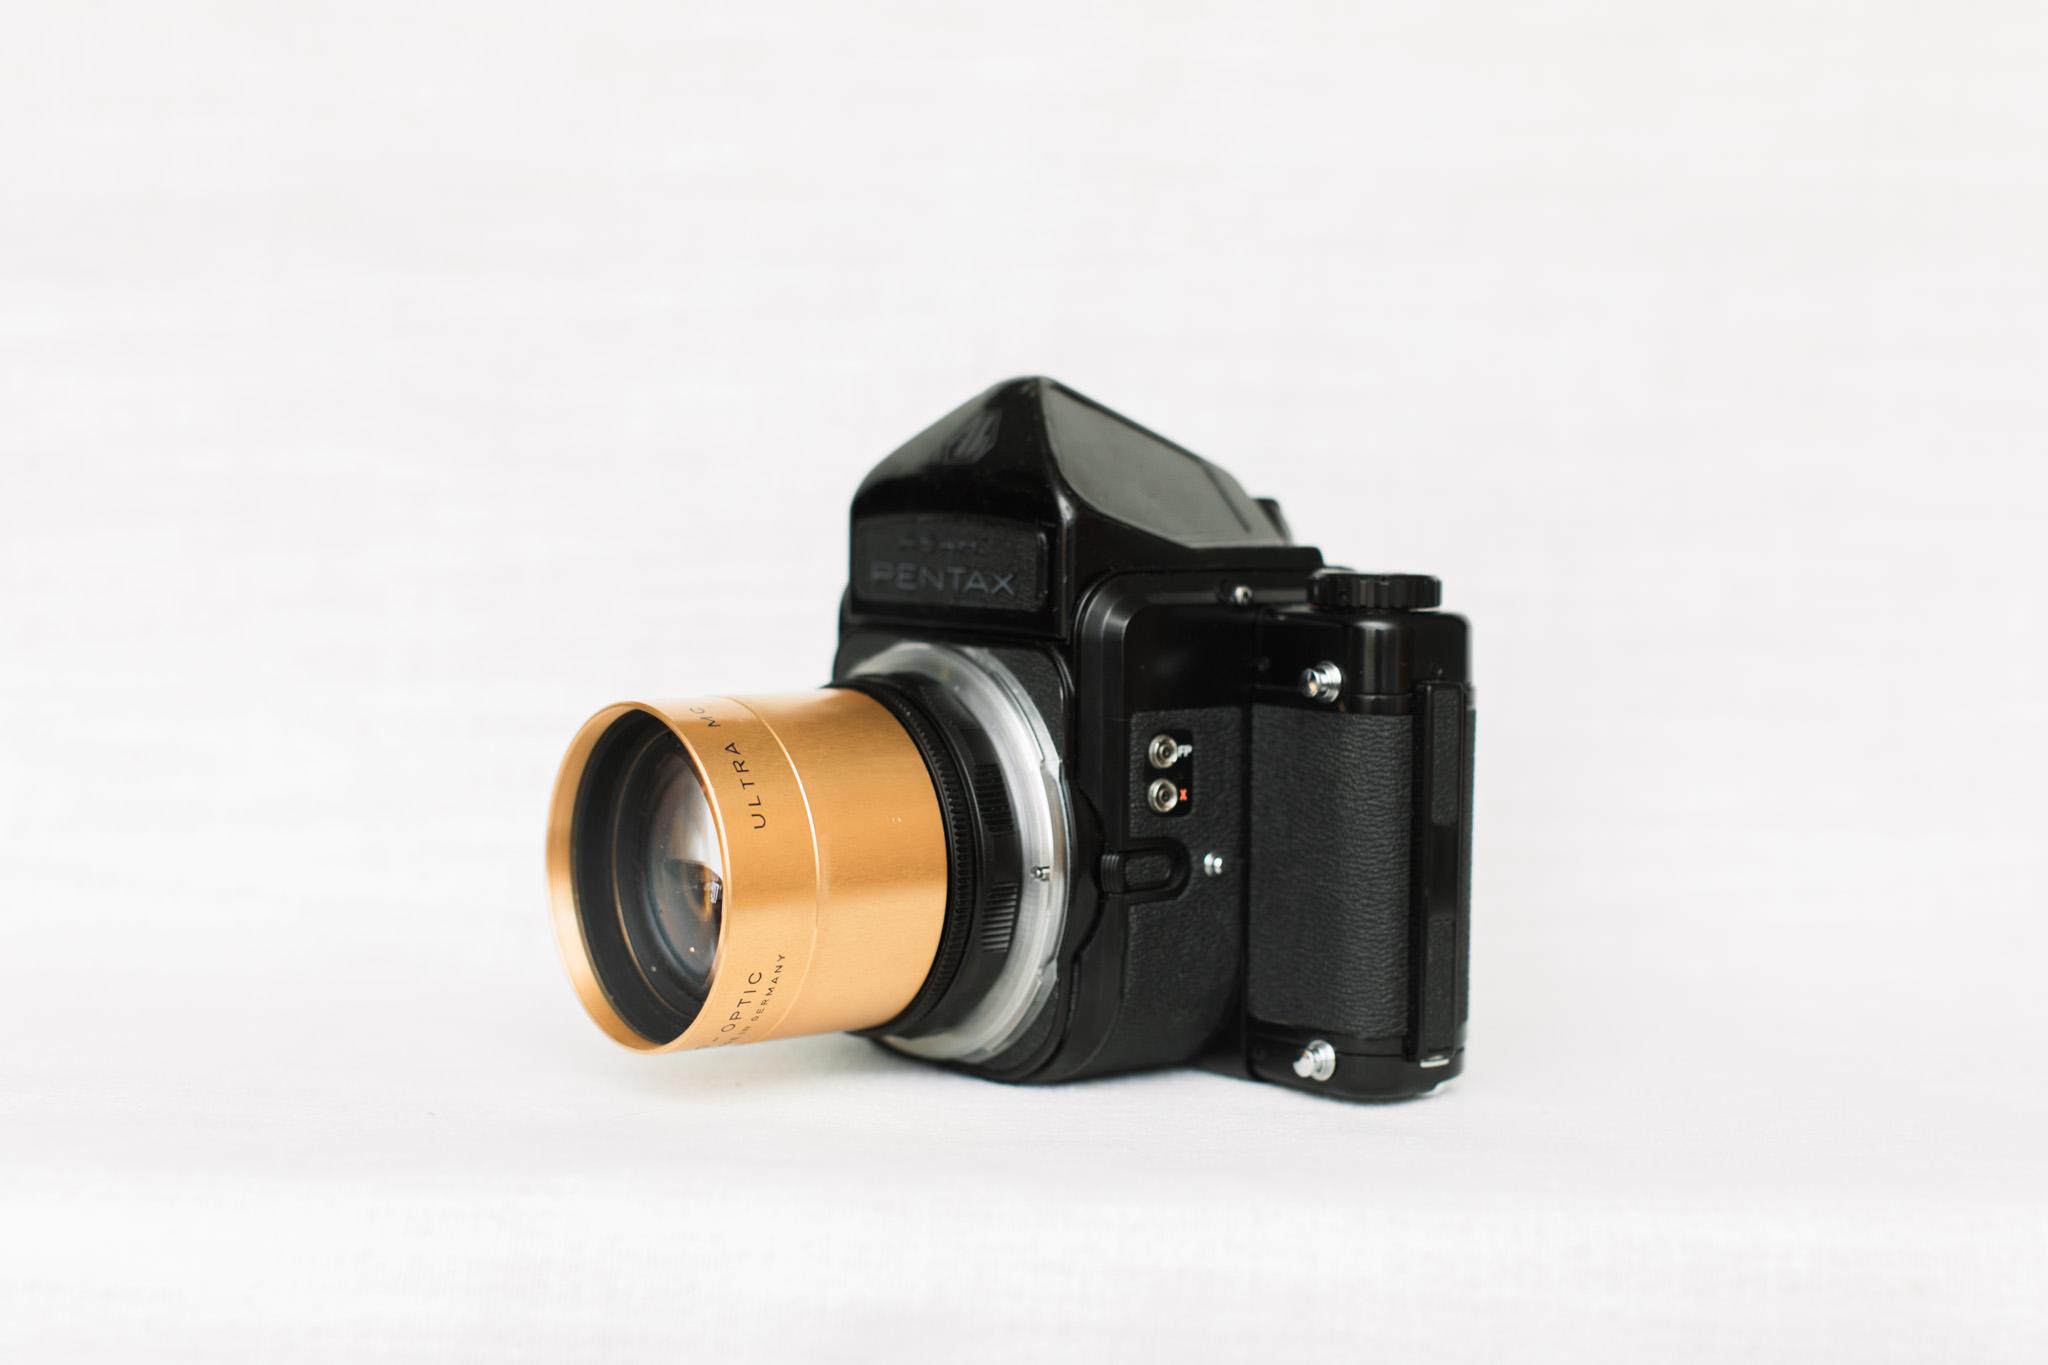 ISCO Ultra MC 110mm f/2 adapted to Pentax 67 film camera